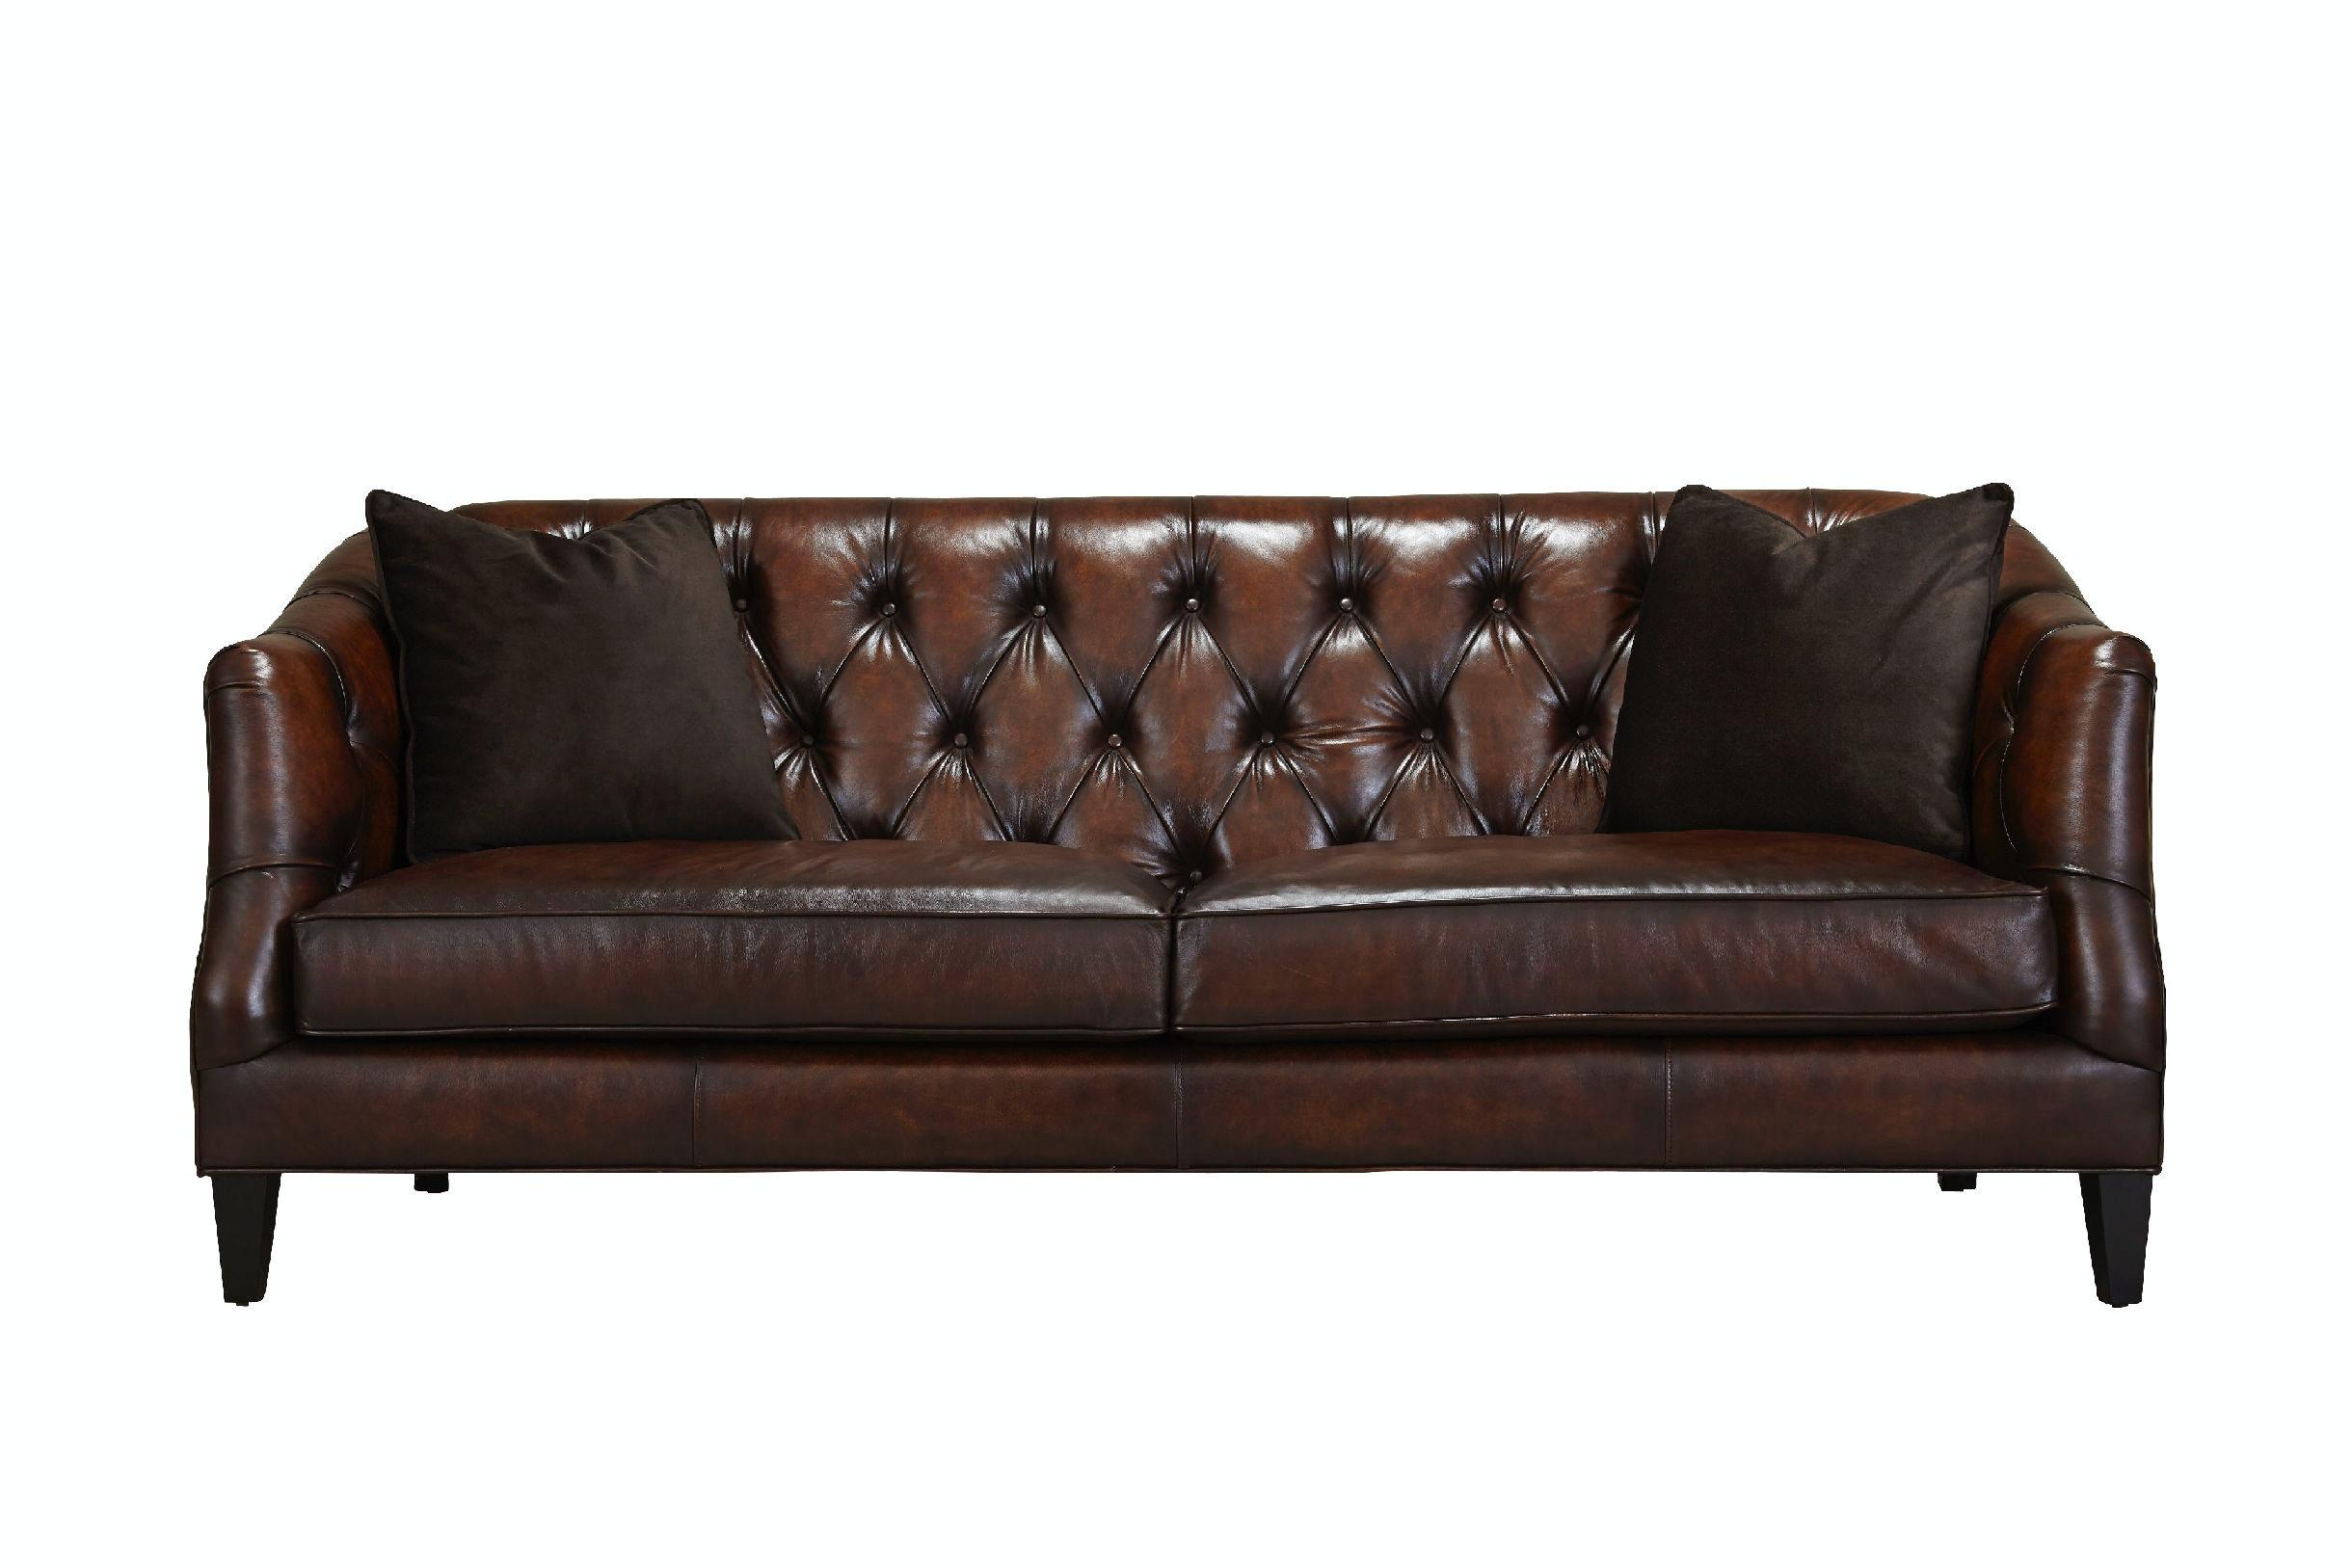 Southern Furniture Camby 2 Cushion Sofa 2 TPS 25361